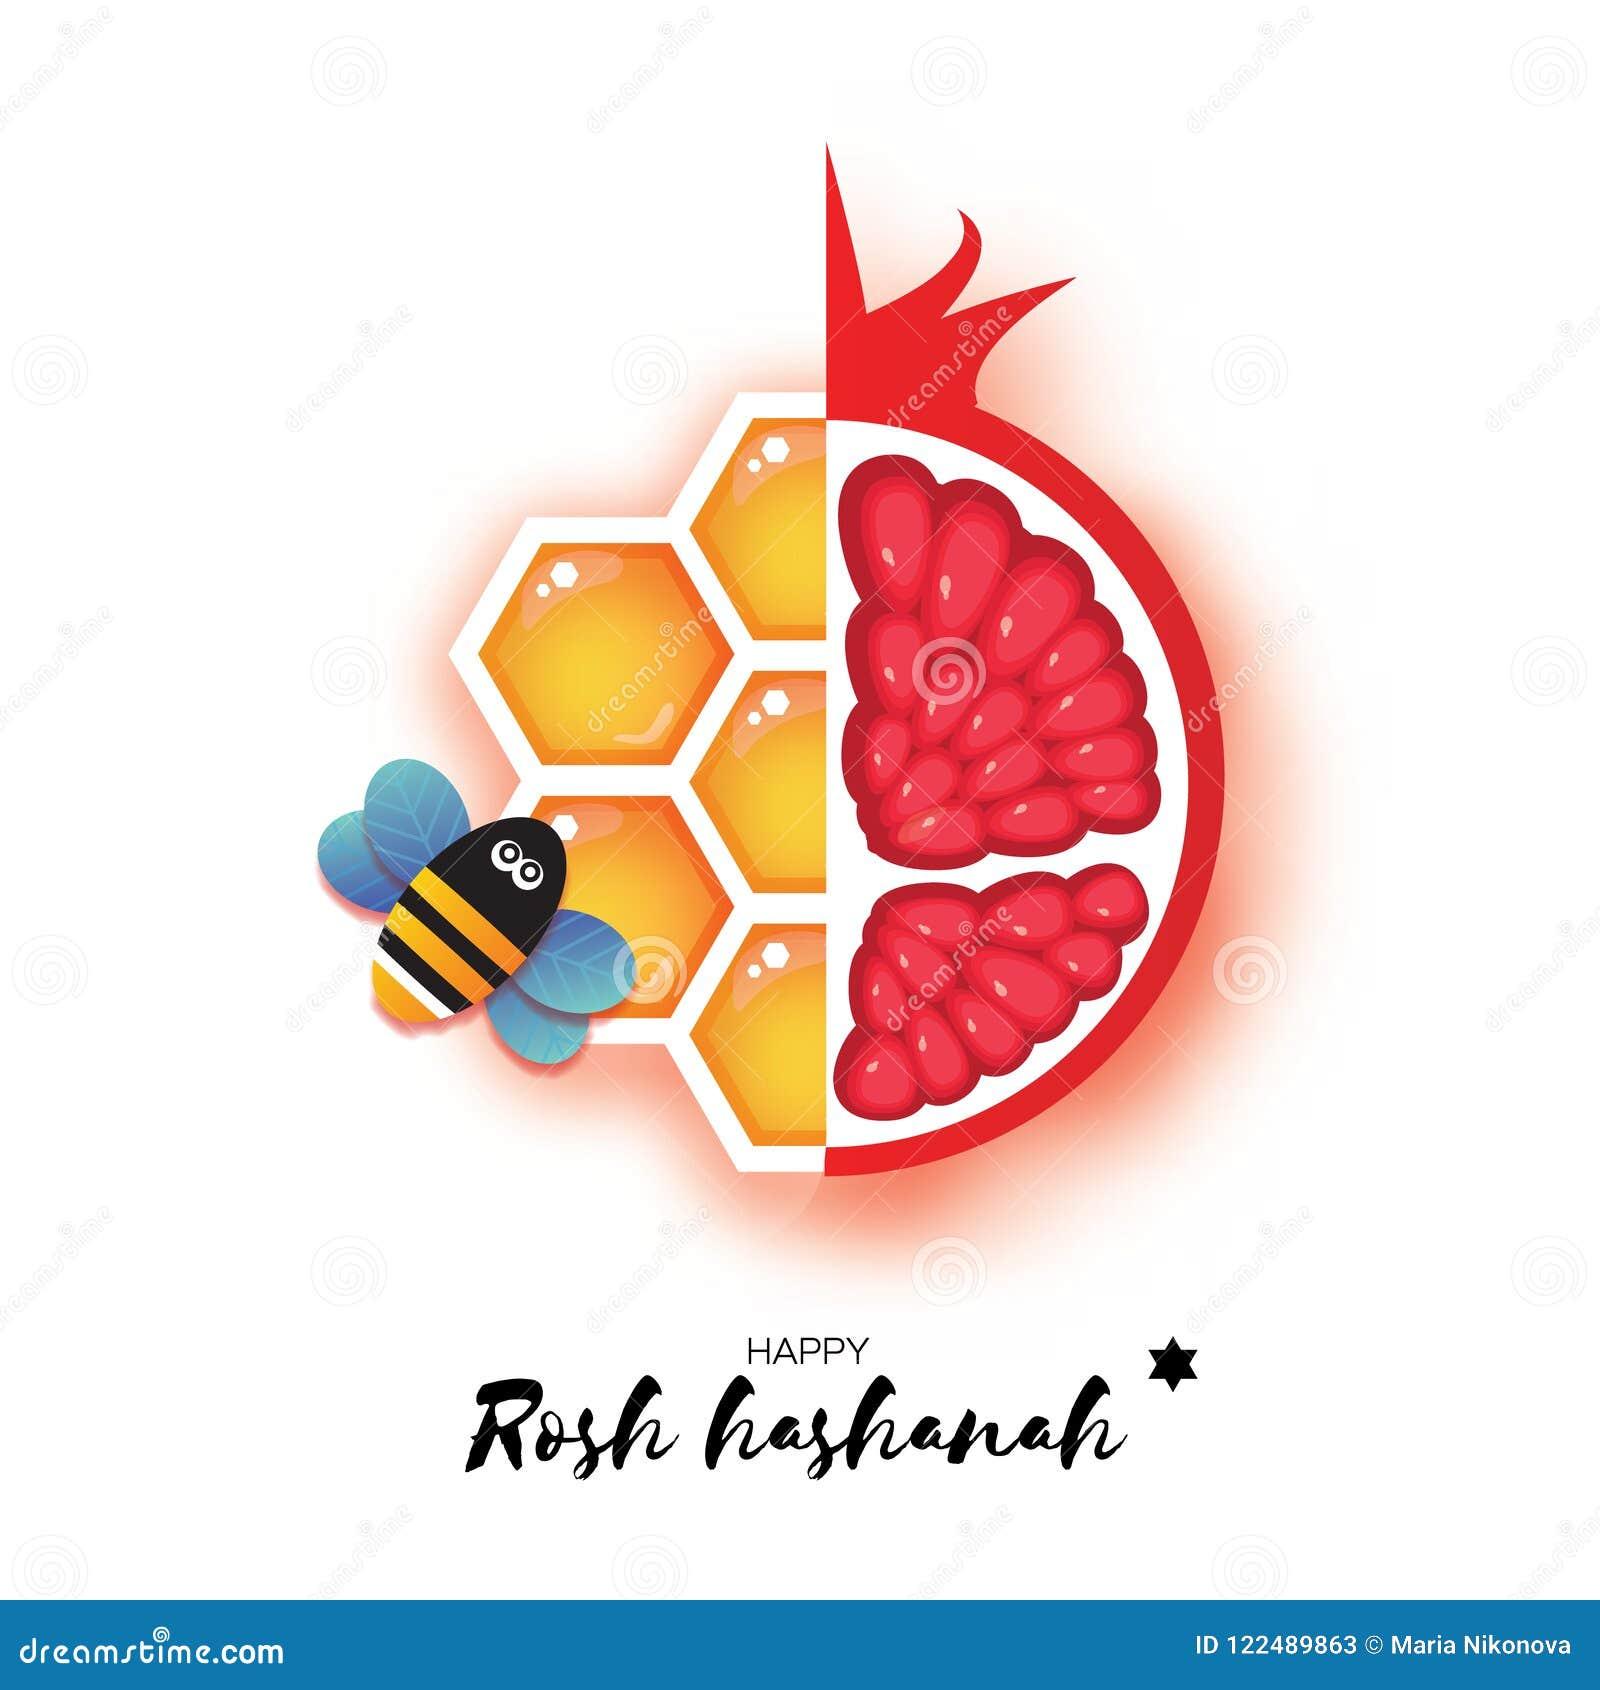 red ripe pomegranate and gold honeycomb jewish new year rosh hashanah greeting card